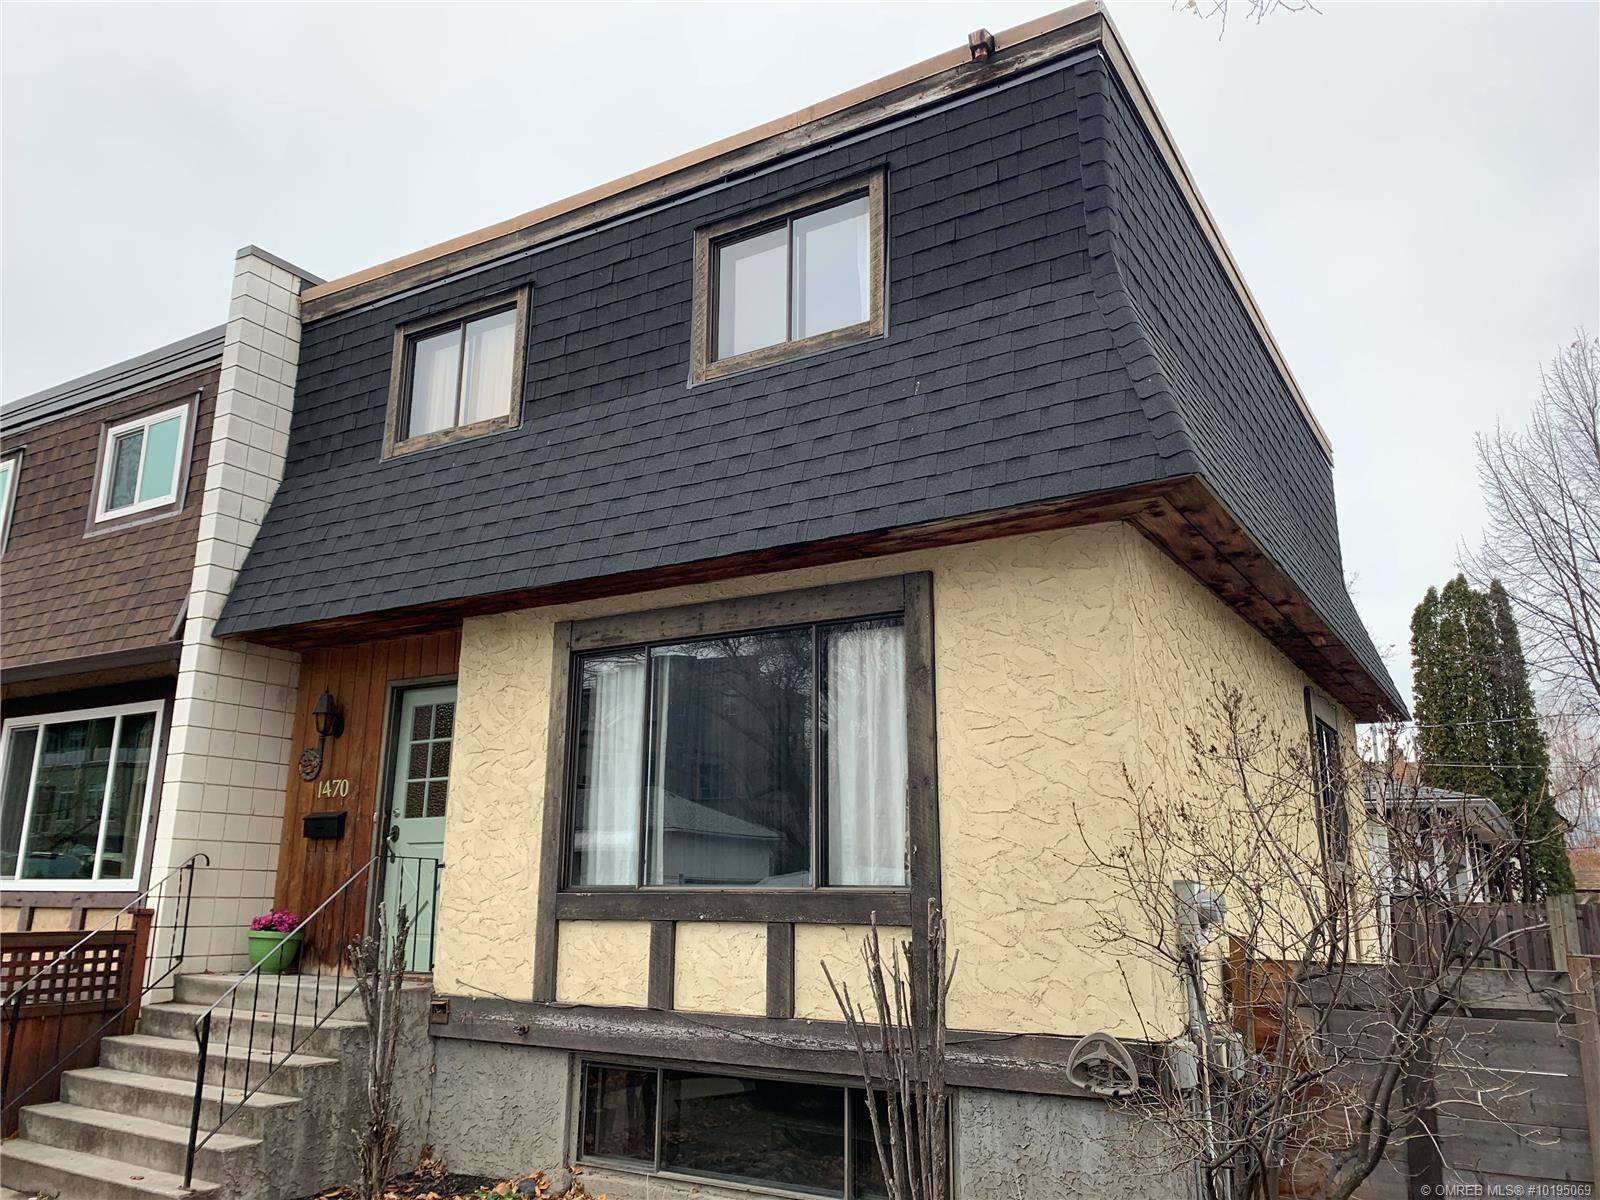 Townhouse for sale at 1470 Graham St Kelowna British Columbia - MLS: 10195069